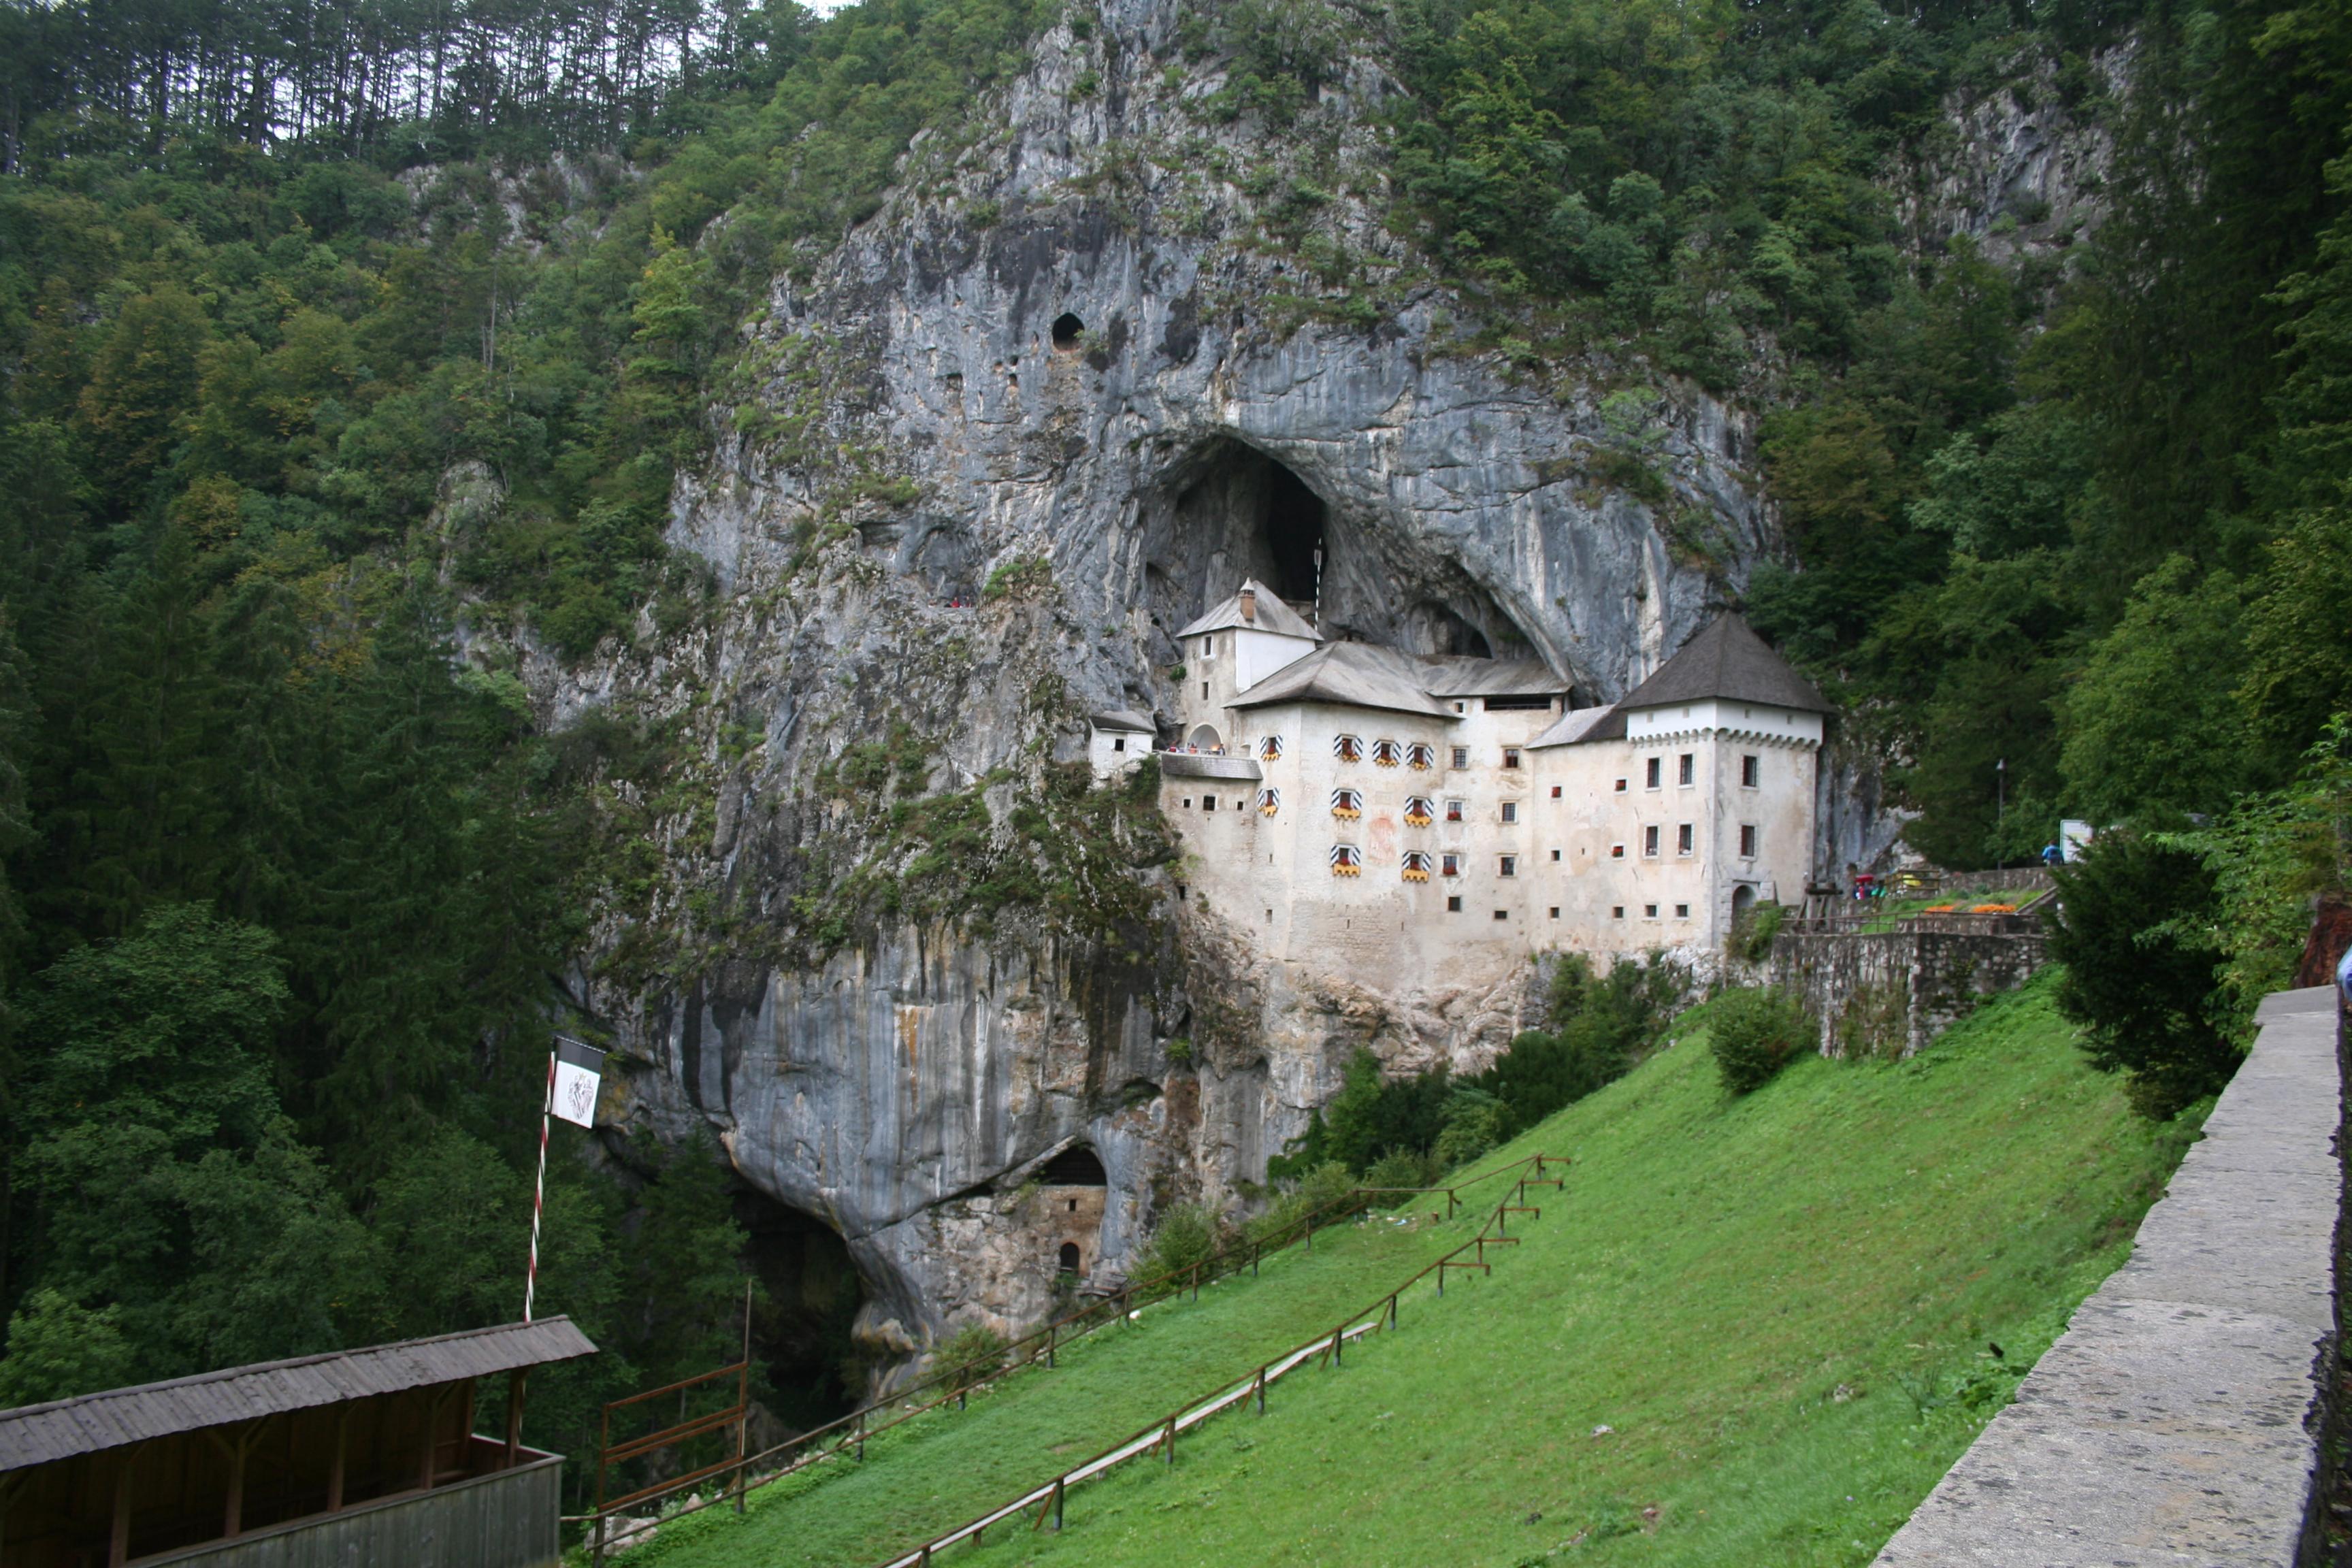 File:PredJama 4.jpg - Wikimedia Commons